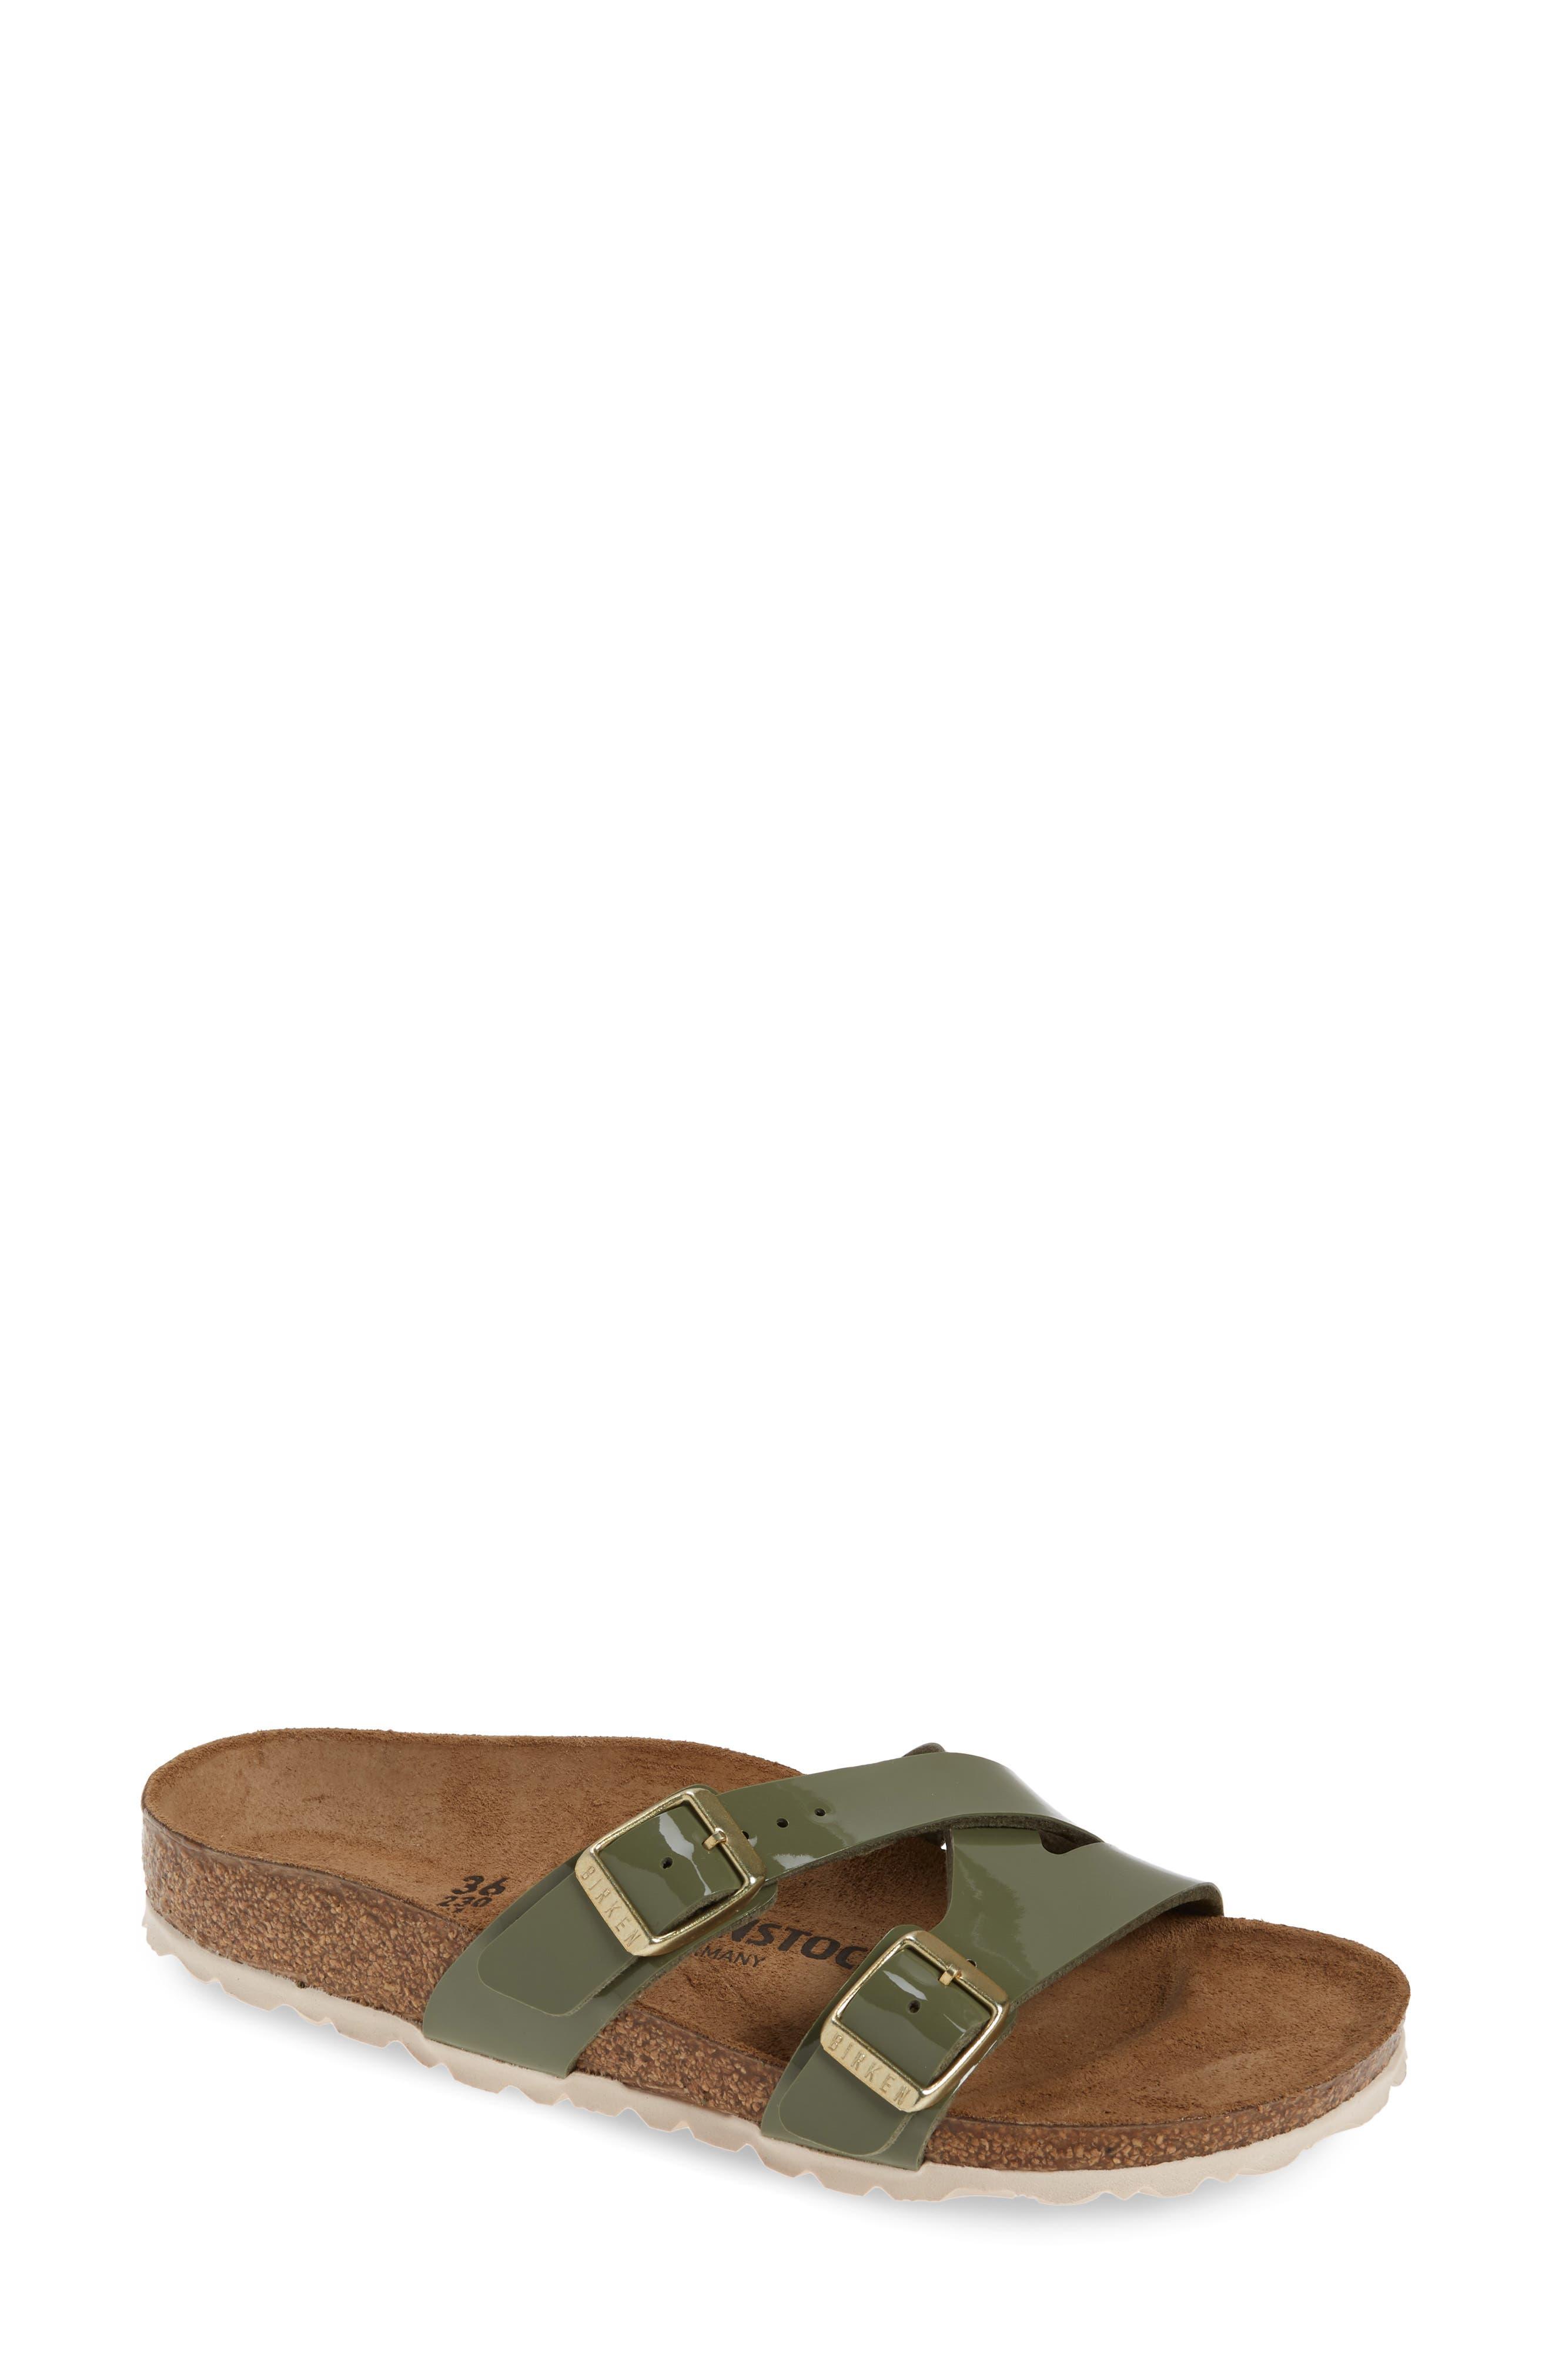 Birkenstock Yao Patent Slide Sandal, Green